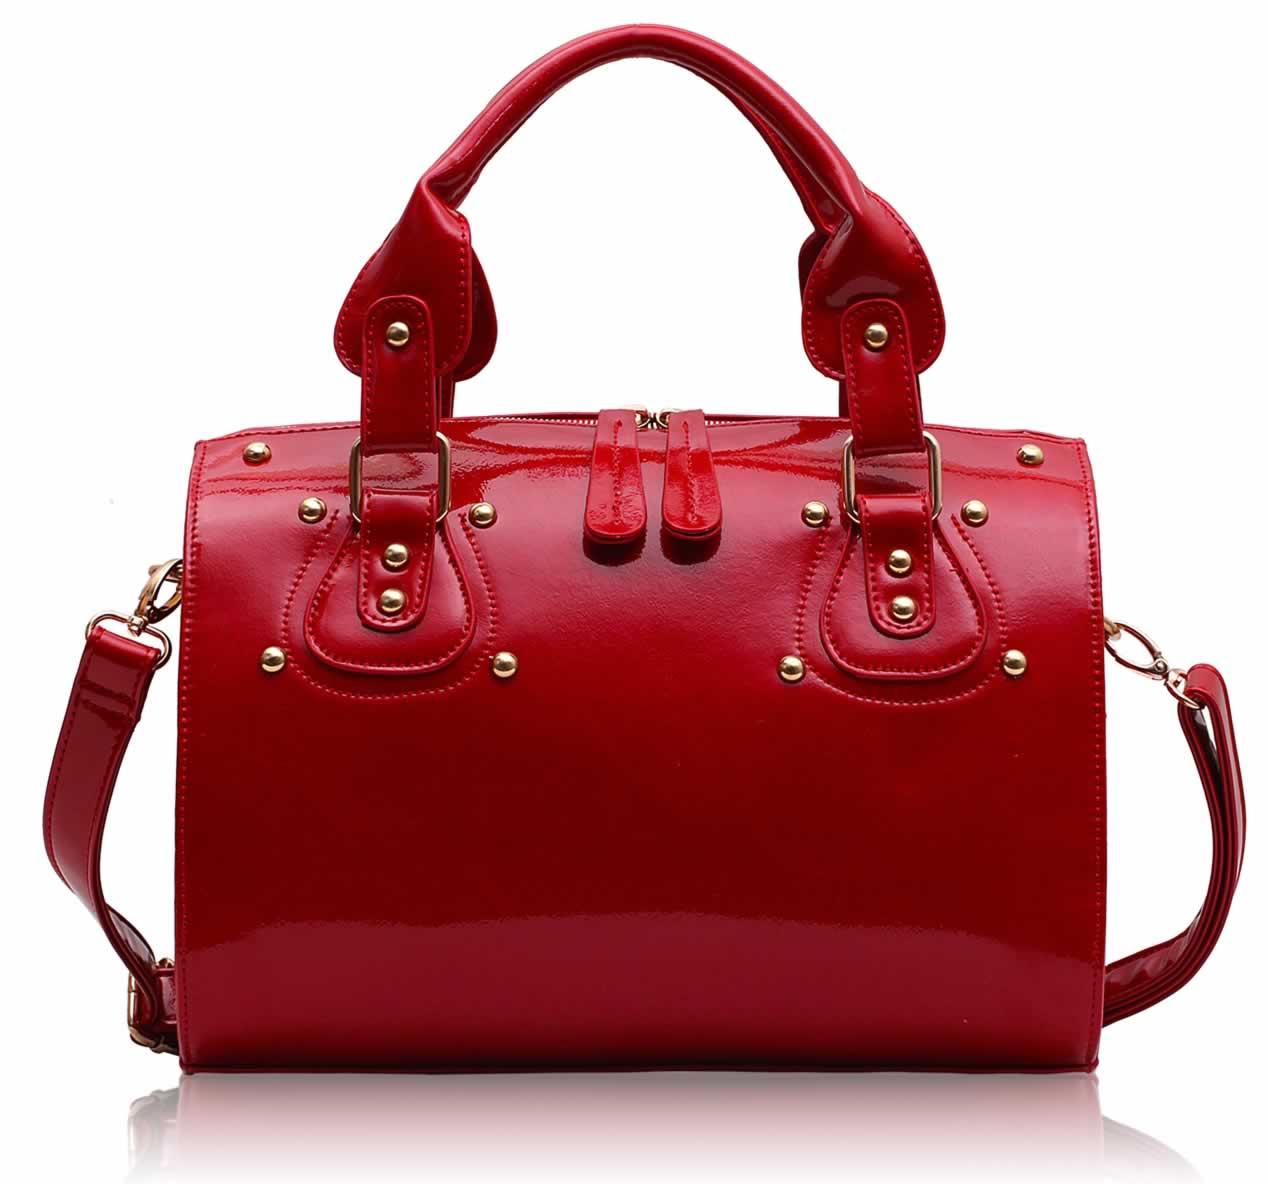 Torebi, torebka, najmodniejsze torebki, torebki na sezon jesień-zima, torebki sezon jesienny